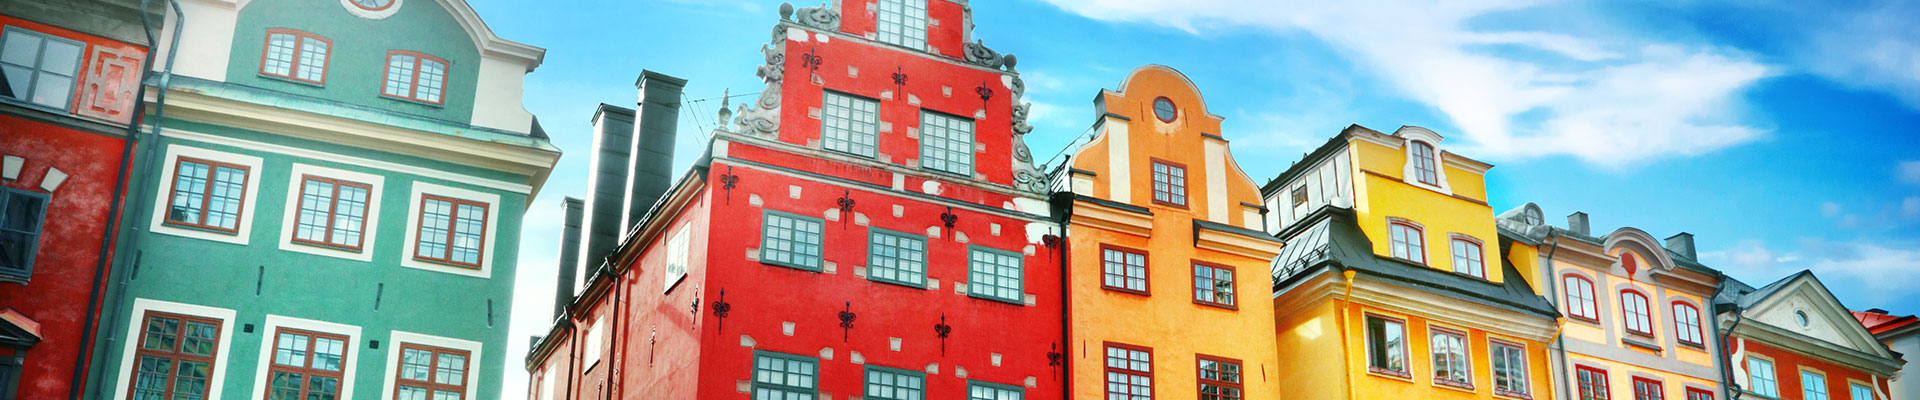 Fantasy RV Tours: 29 Day Scandinavia (29OSCP-082620)